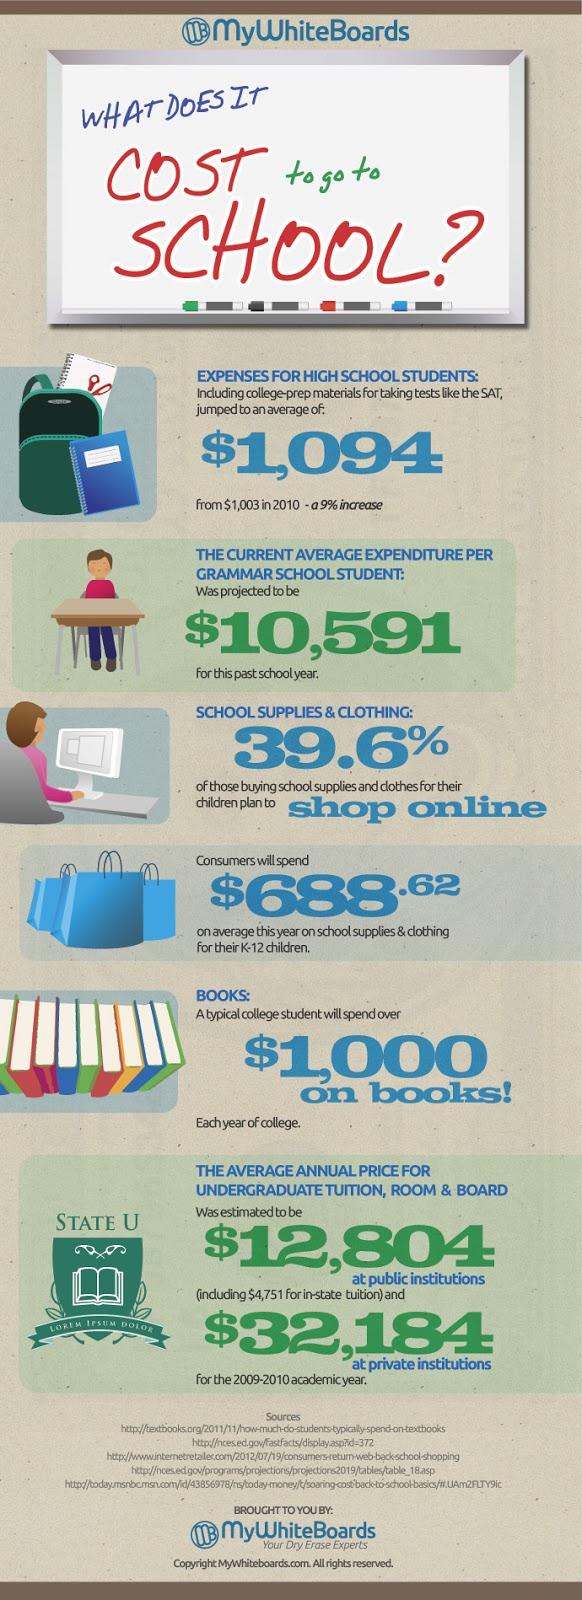 School cost infographic.